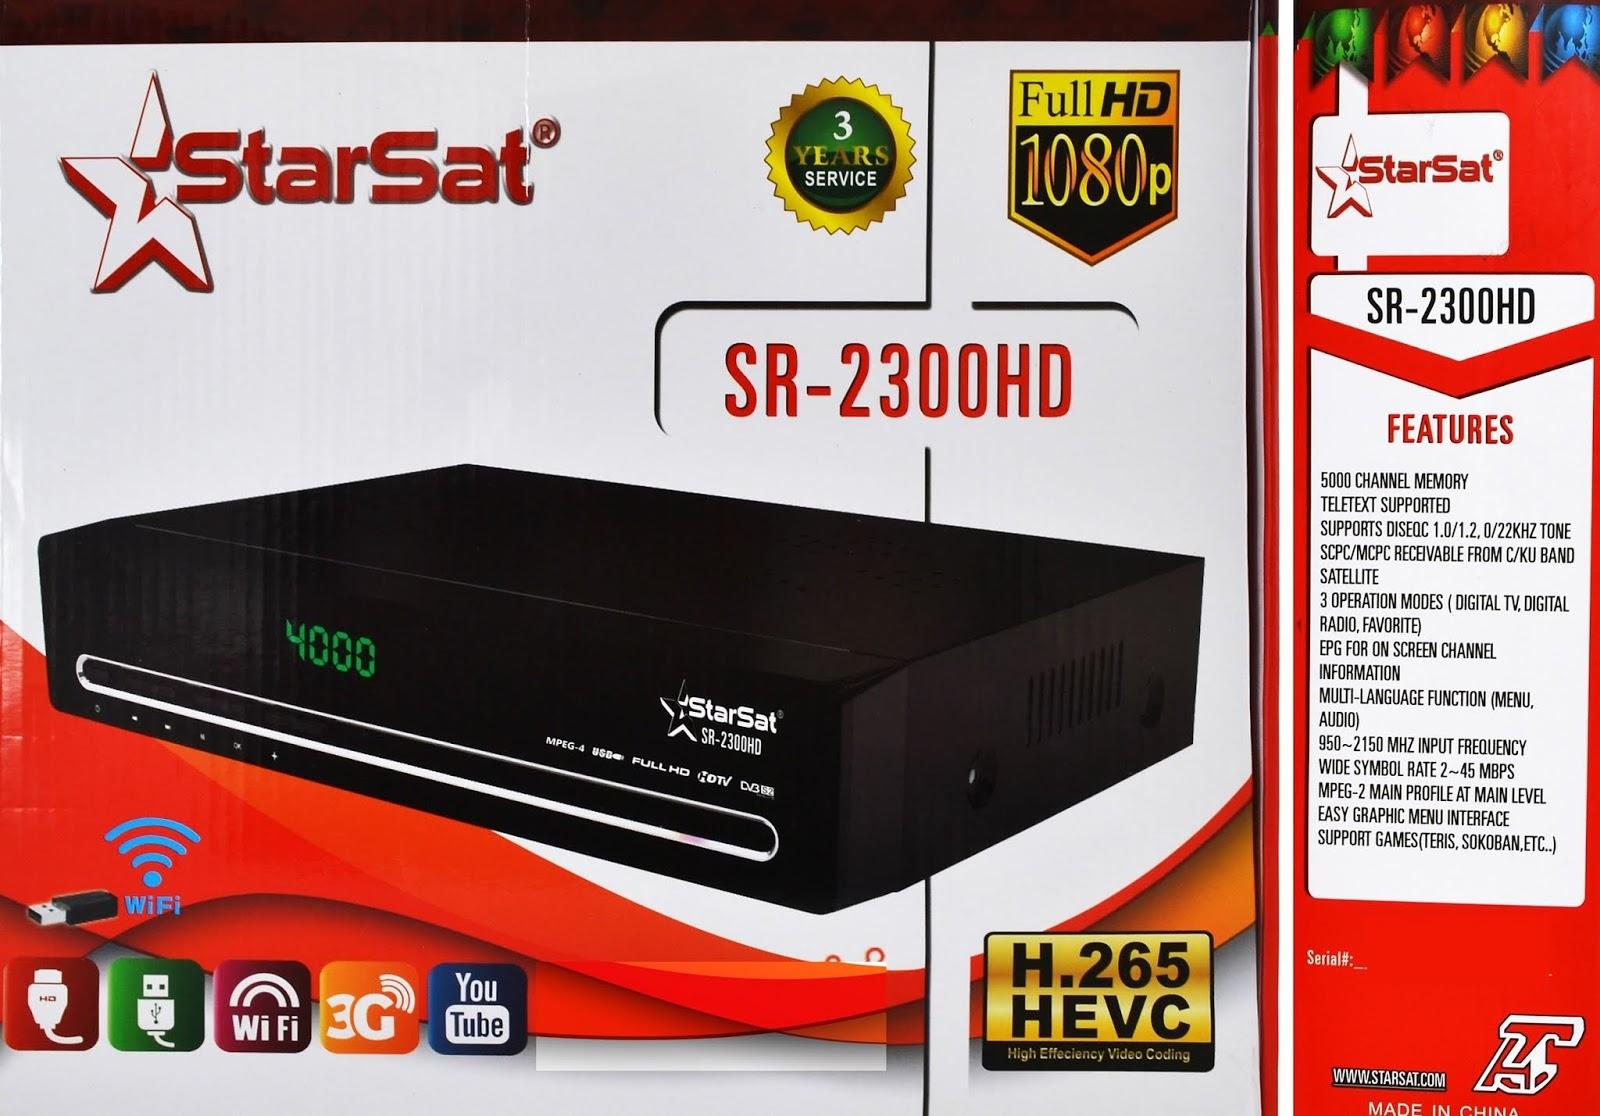 StarSat 2300 HD Receiver New Software Download 2019 – Saeed Online